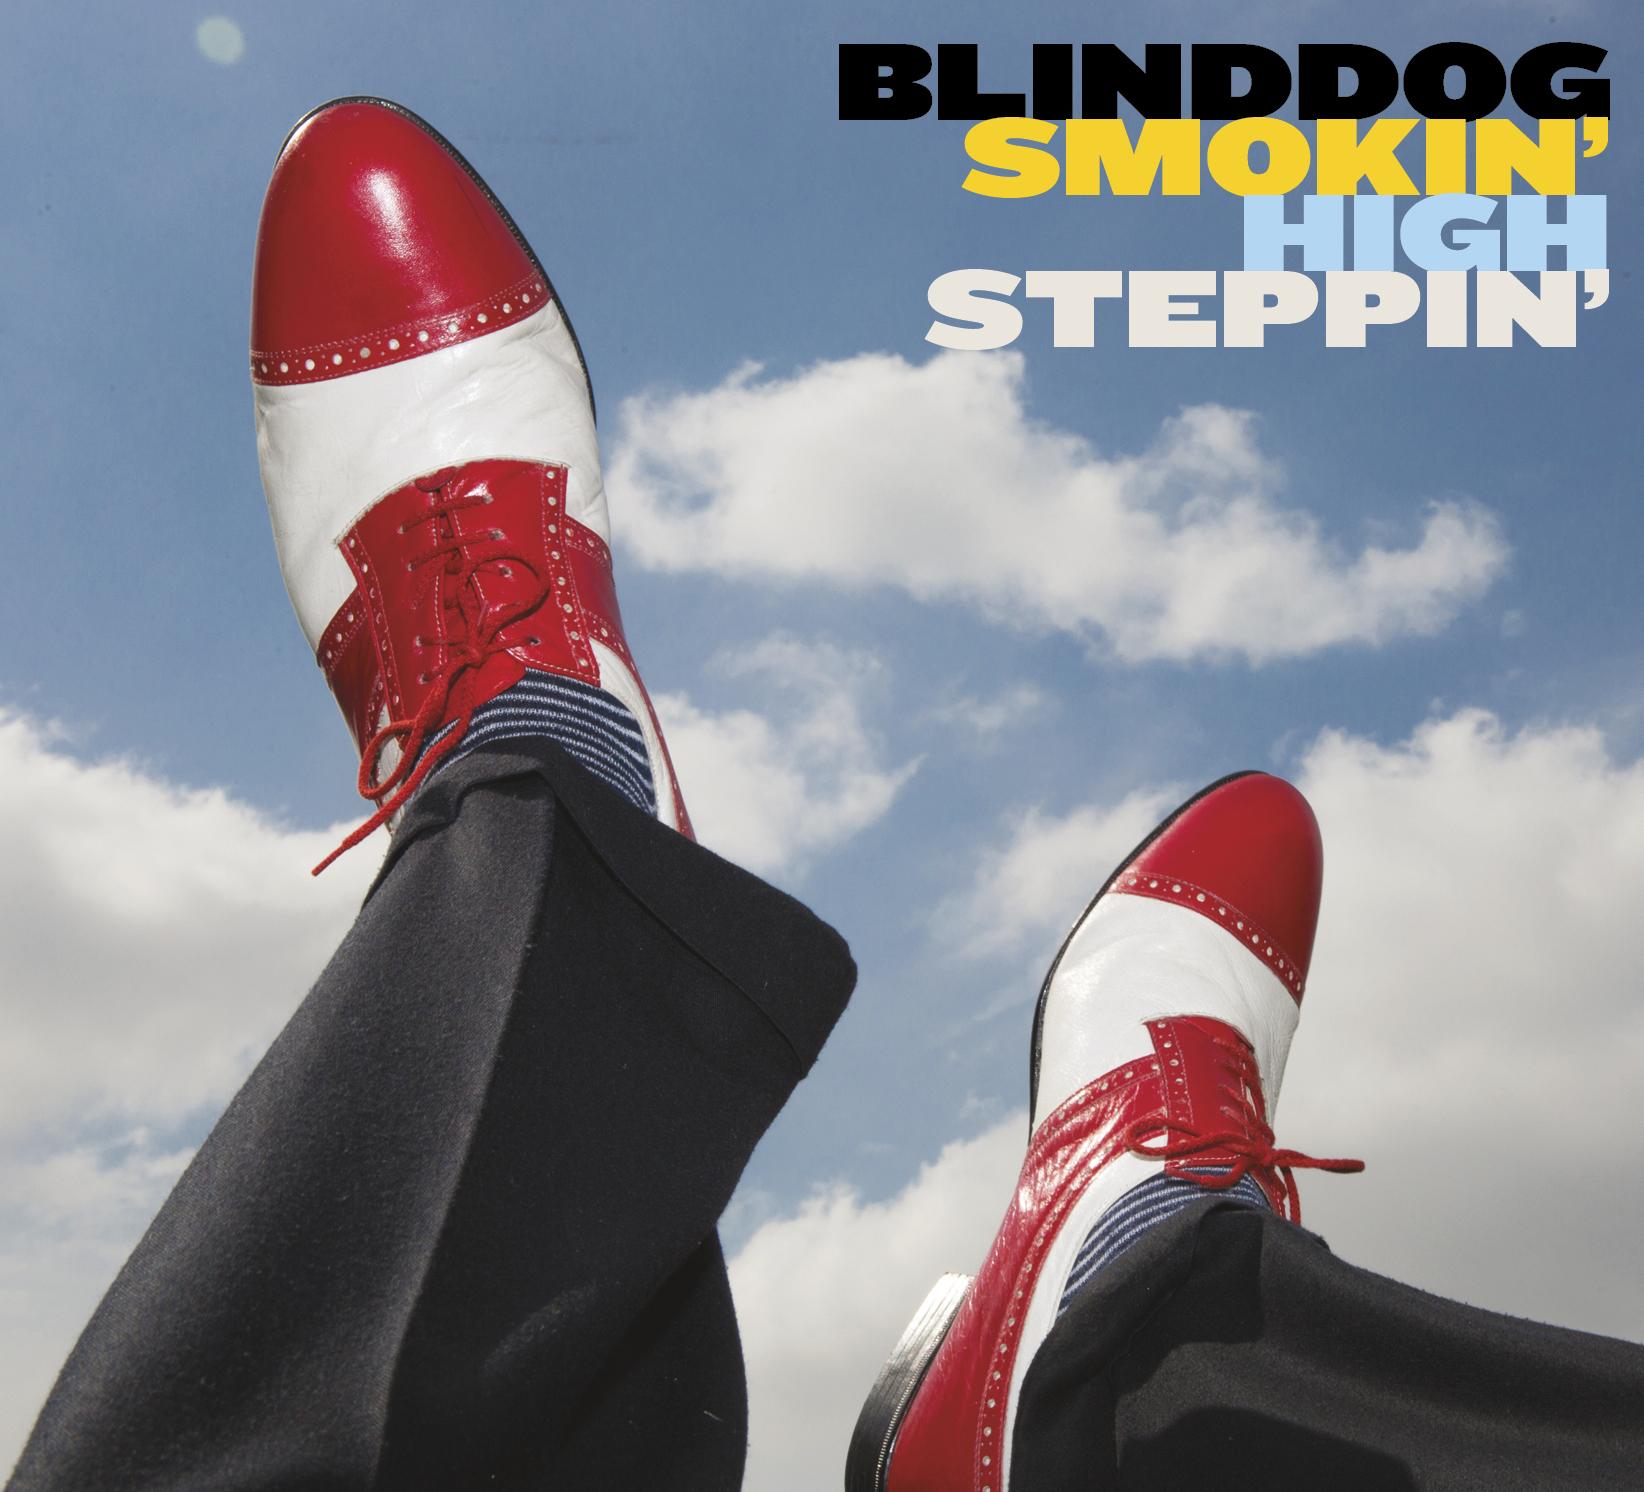 High Steppin' - BLINDDOG SMOKIN'Silver Talon Records/ Music Avenue/ Blues BoulevardJuly 17th, 2015